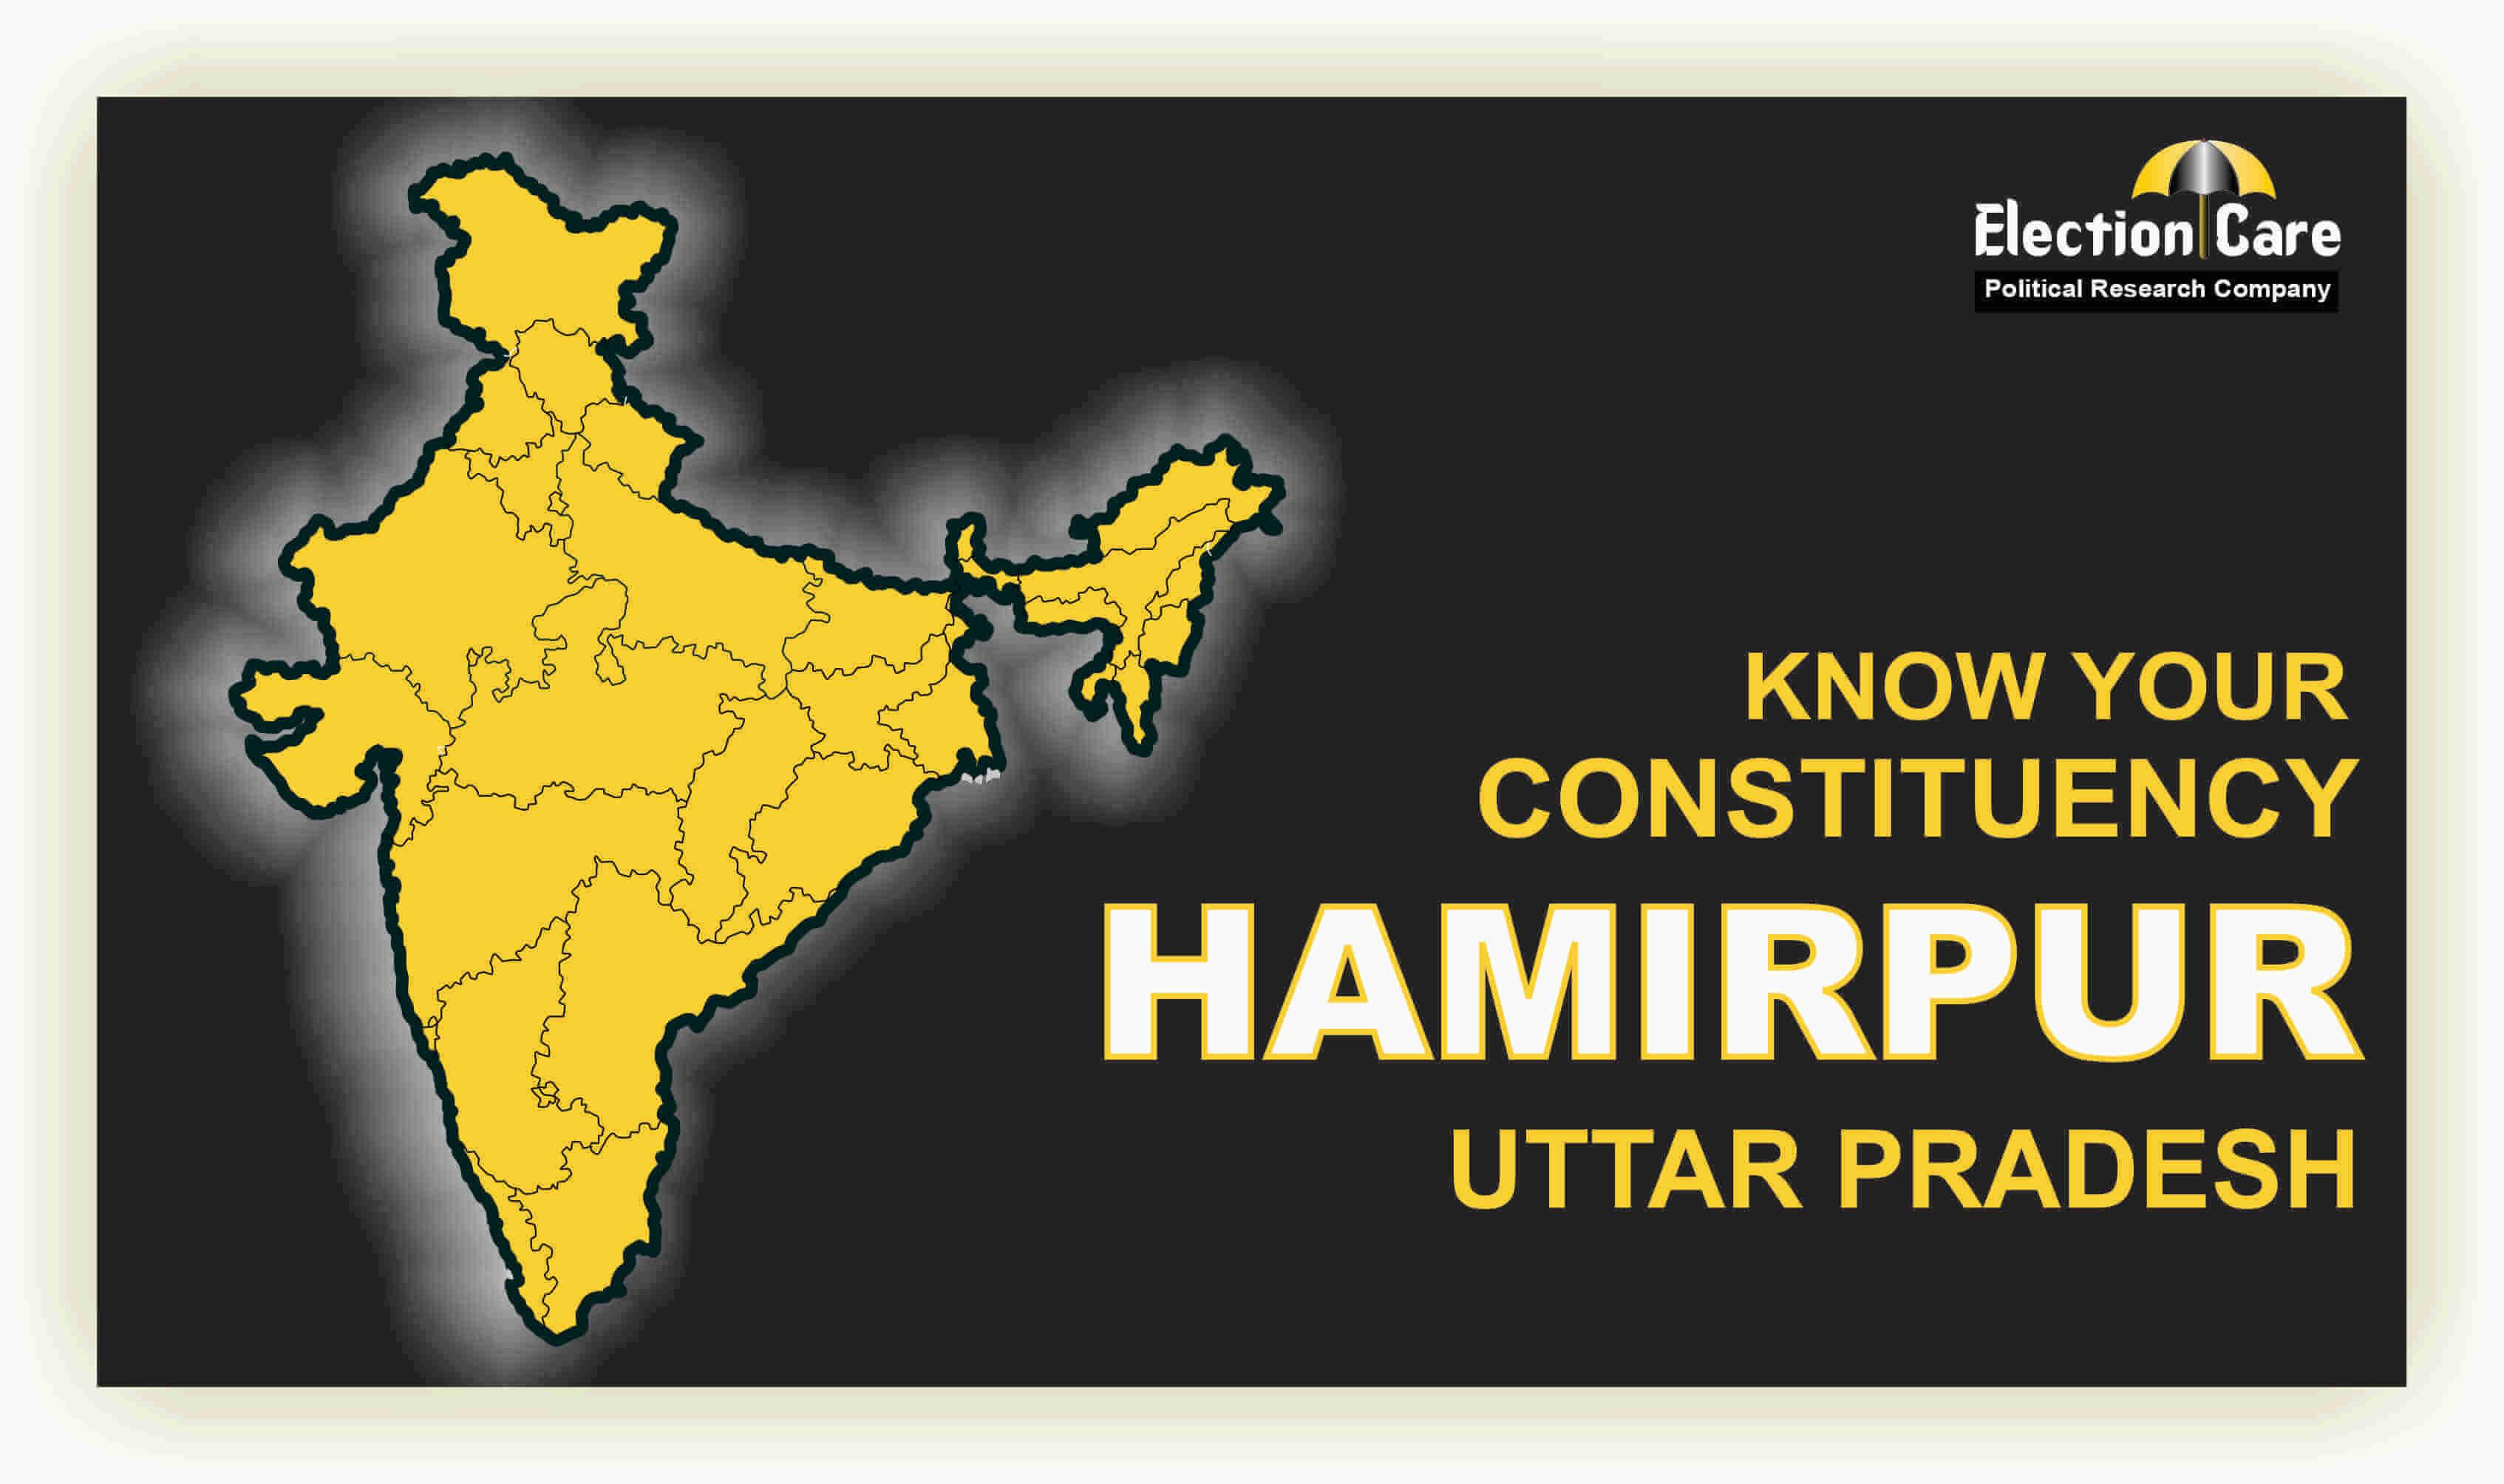 Hamirpur Parliament Election Result